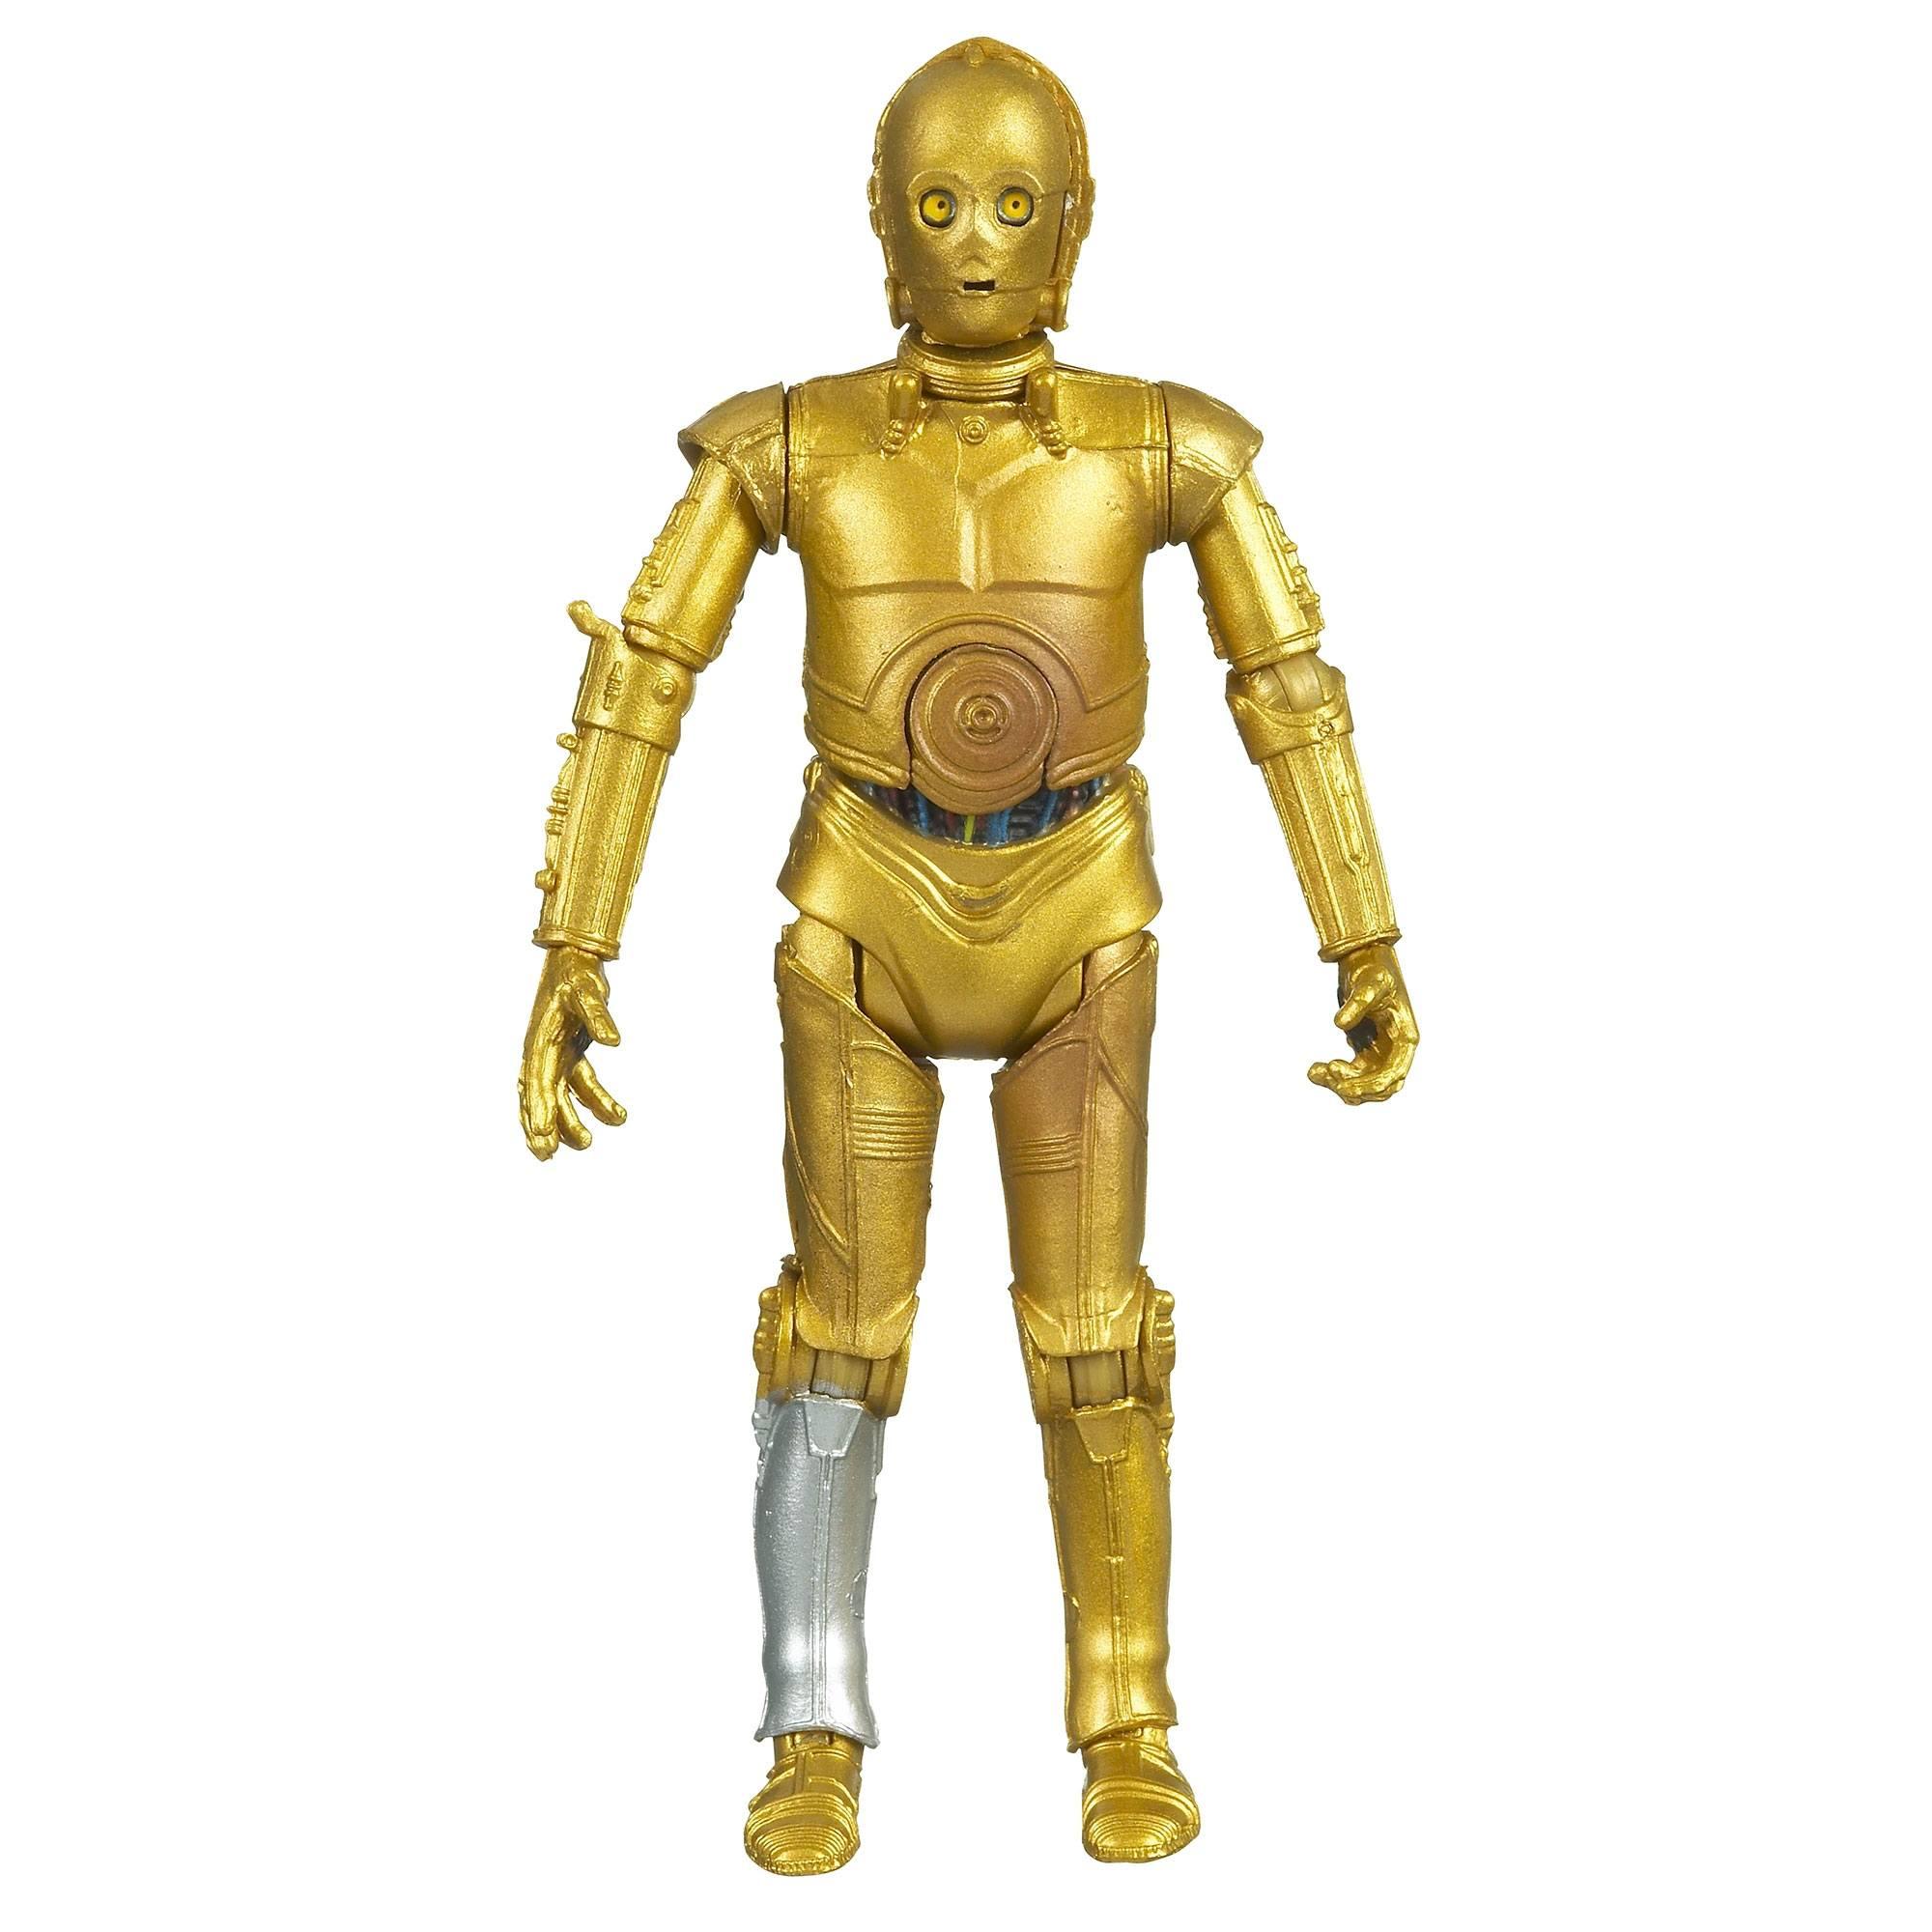 Star Wars Vintage Collection C-3PO 10cm E9572 5010993704538